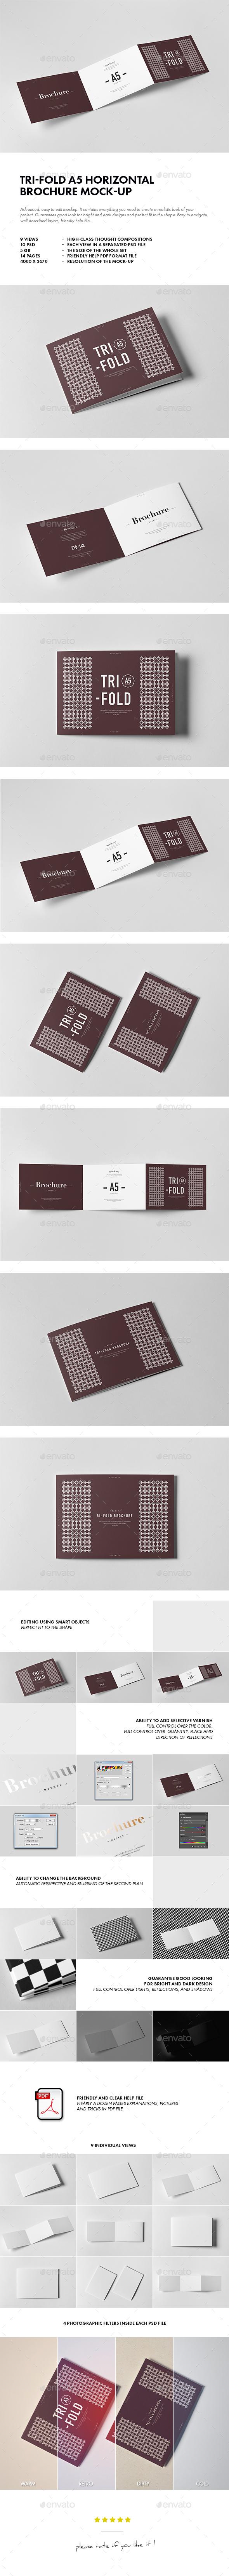 Tri-Fold A5 Horizontal Brochure 2 - Brochures Print